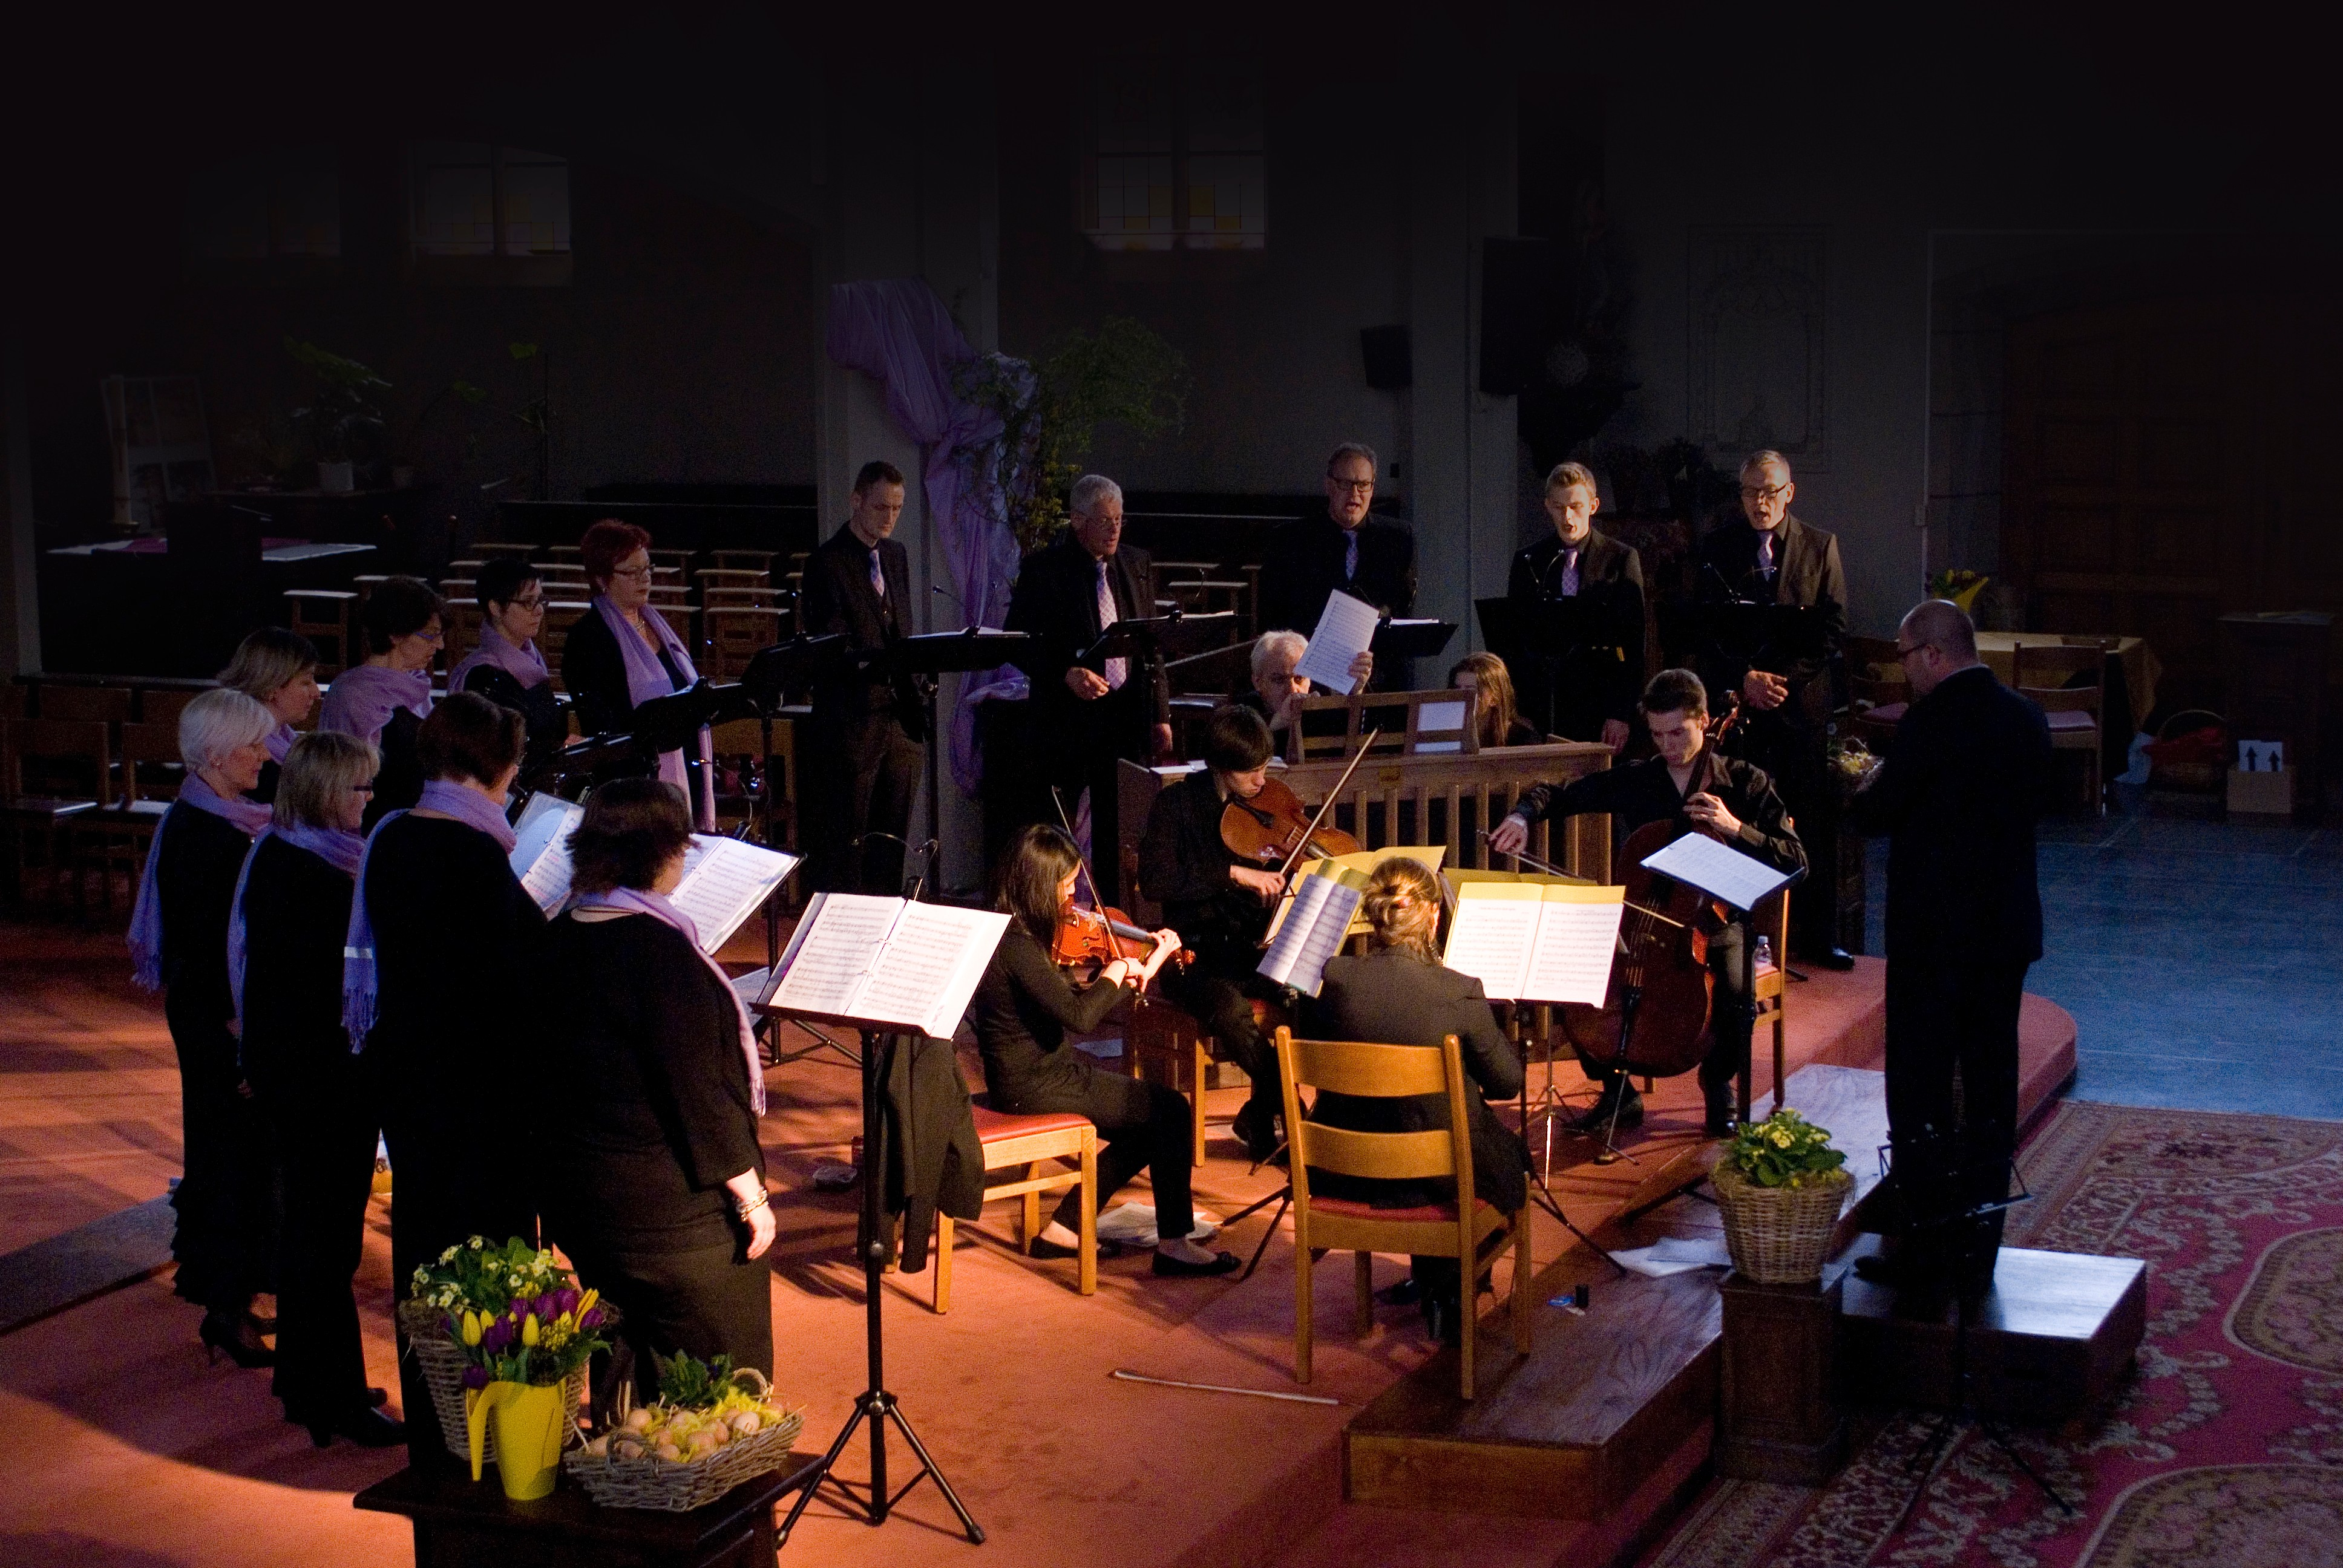 Vocarde zingt vol Passie tot Pasen - 6 april 2014